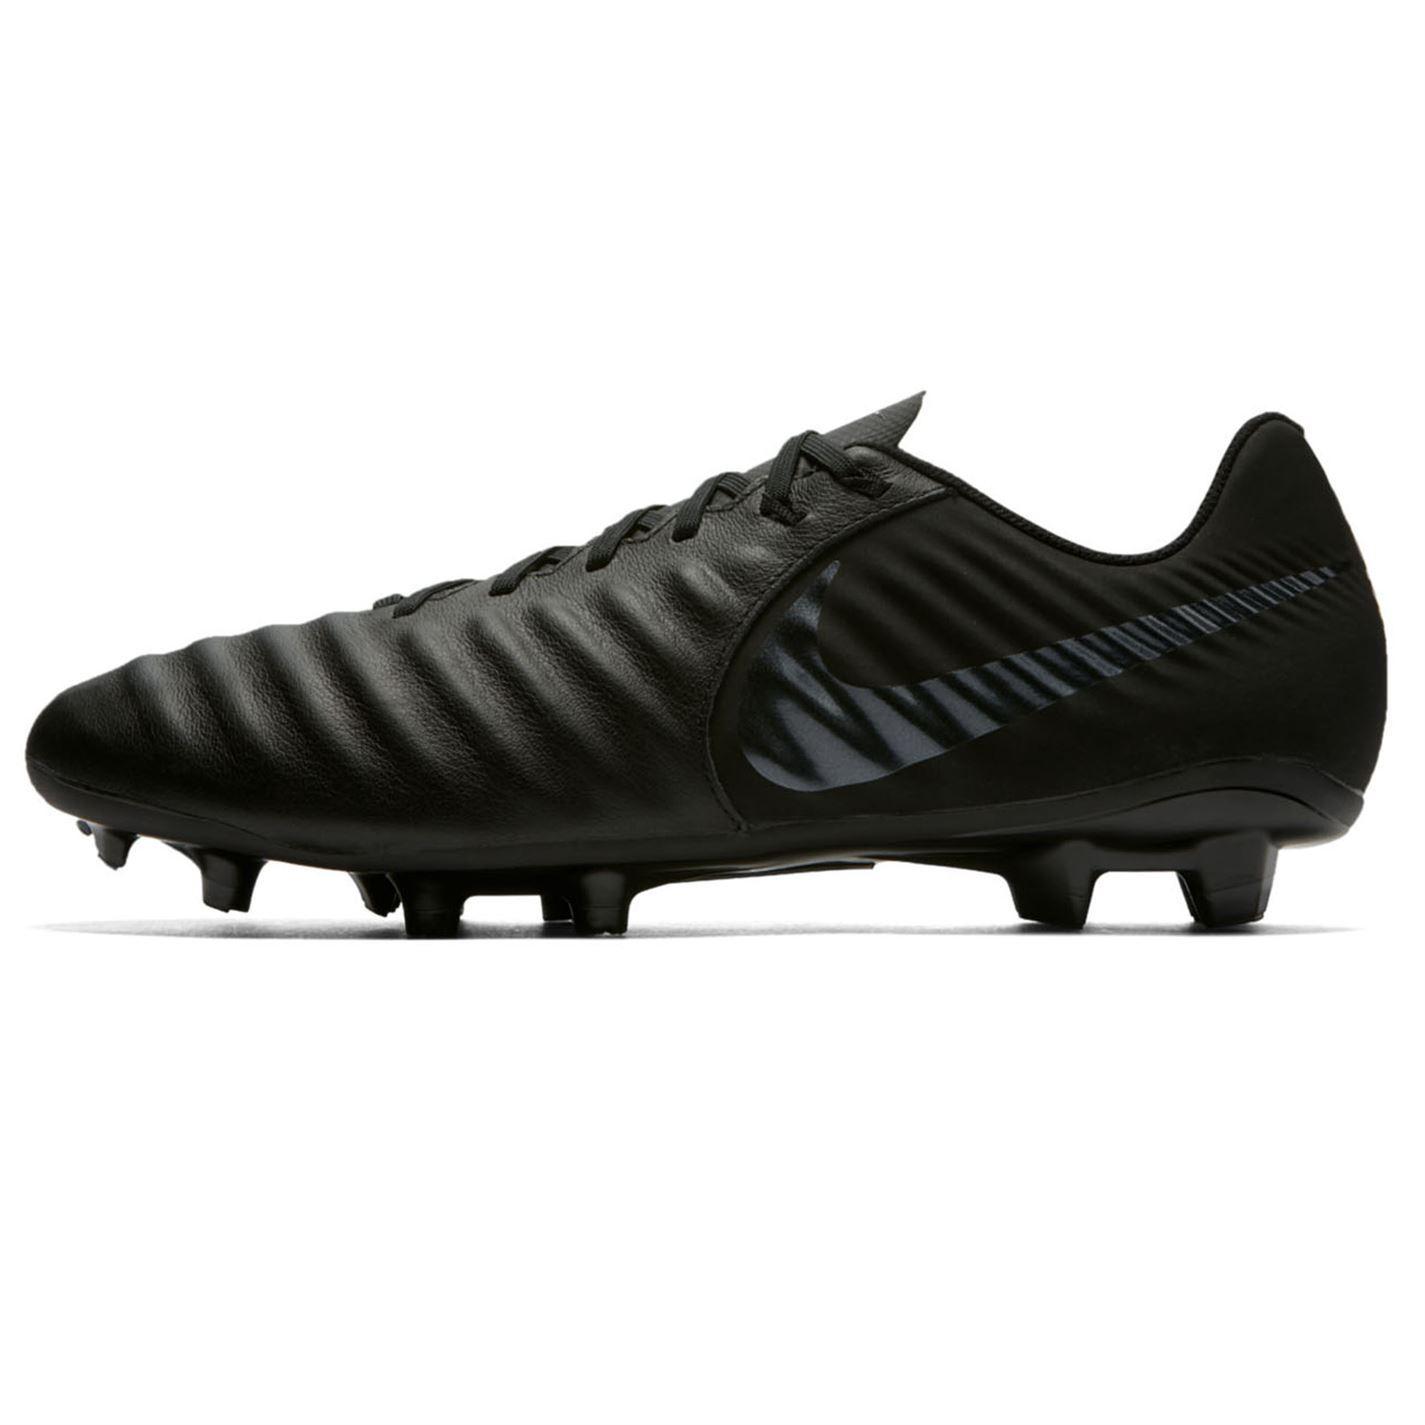 miniature 8 - Nike-Tiempo-Legend-Academy-FG-Firm-Ground-Chaussures-De-Football-Homme-Football-Chaussures-Crampons